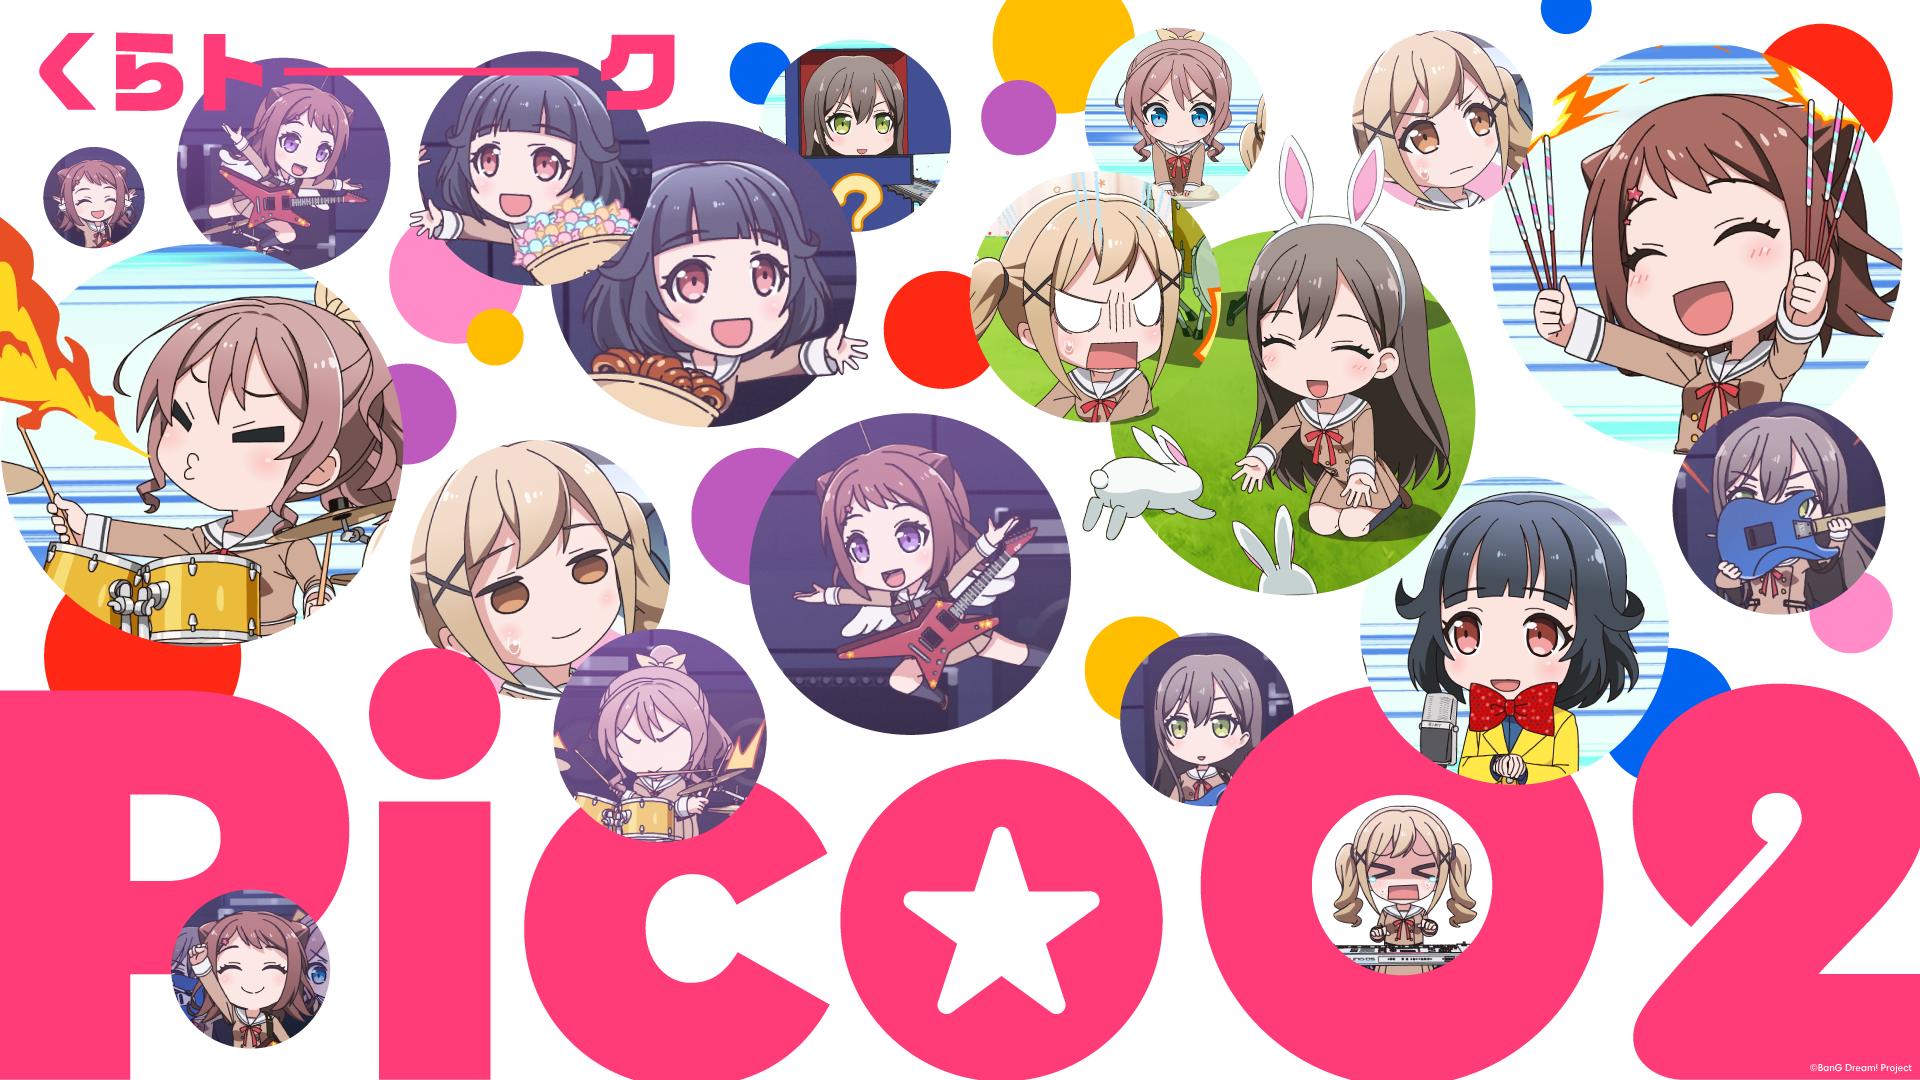 Pico02壁紙プレゼント Bang Dream ガルパ ピコ 大盛り 公式サイト